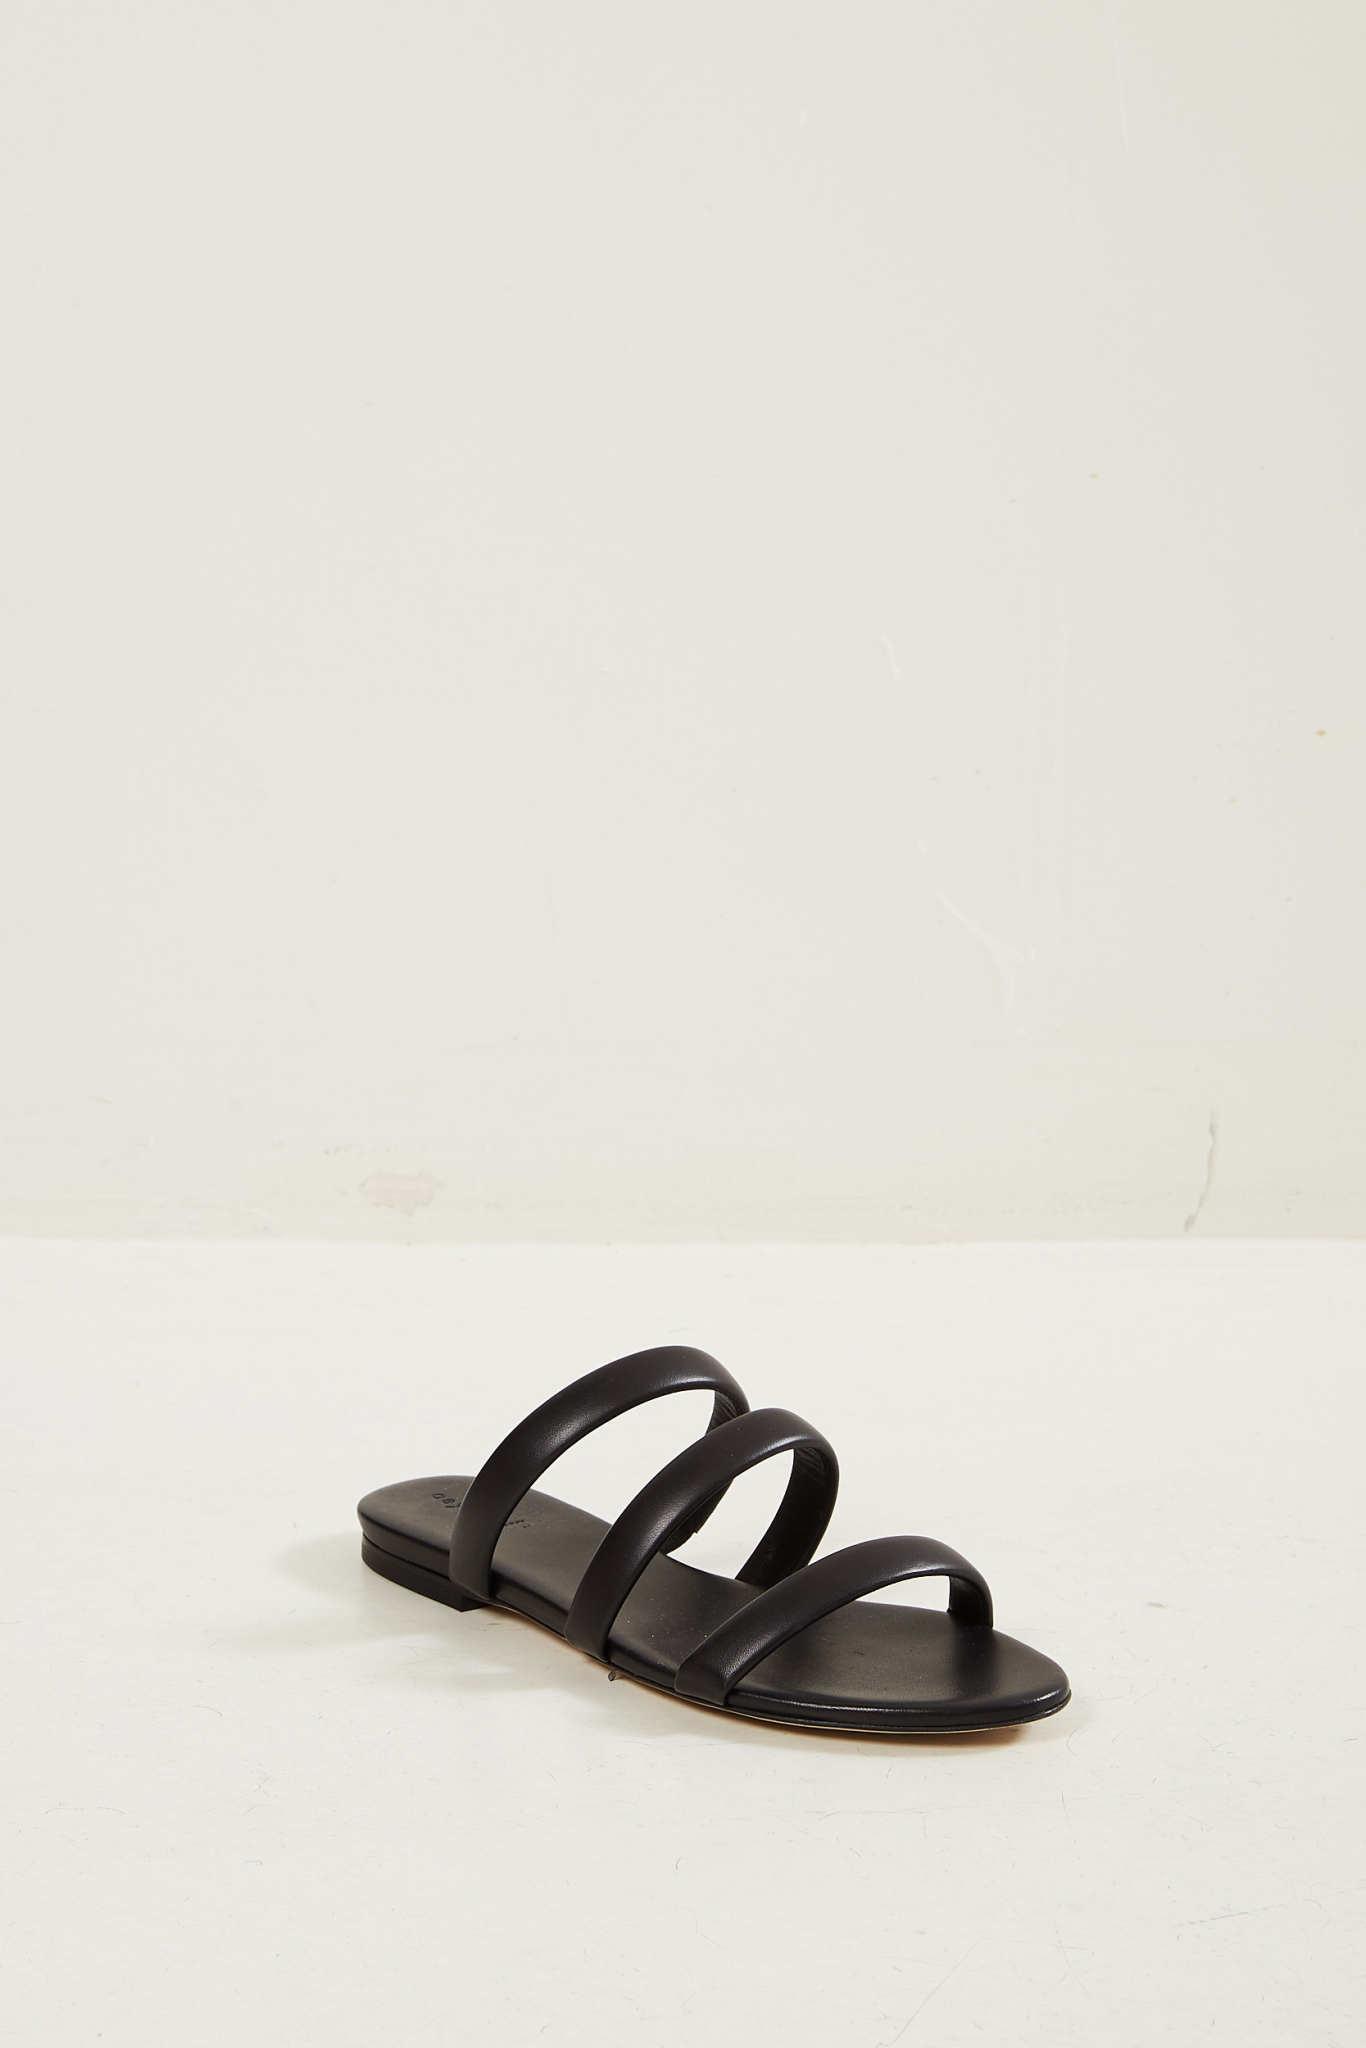 Aeyde Chrissy sandals Black.